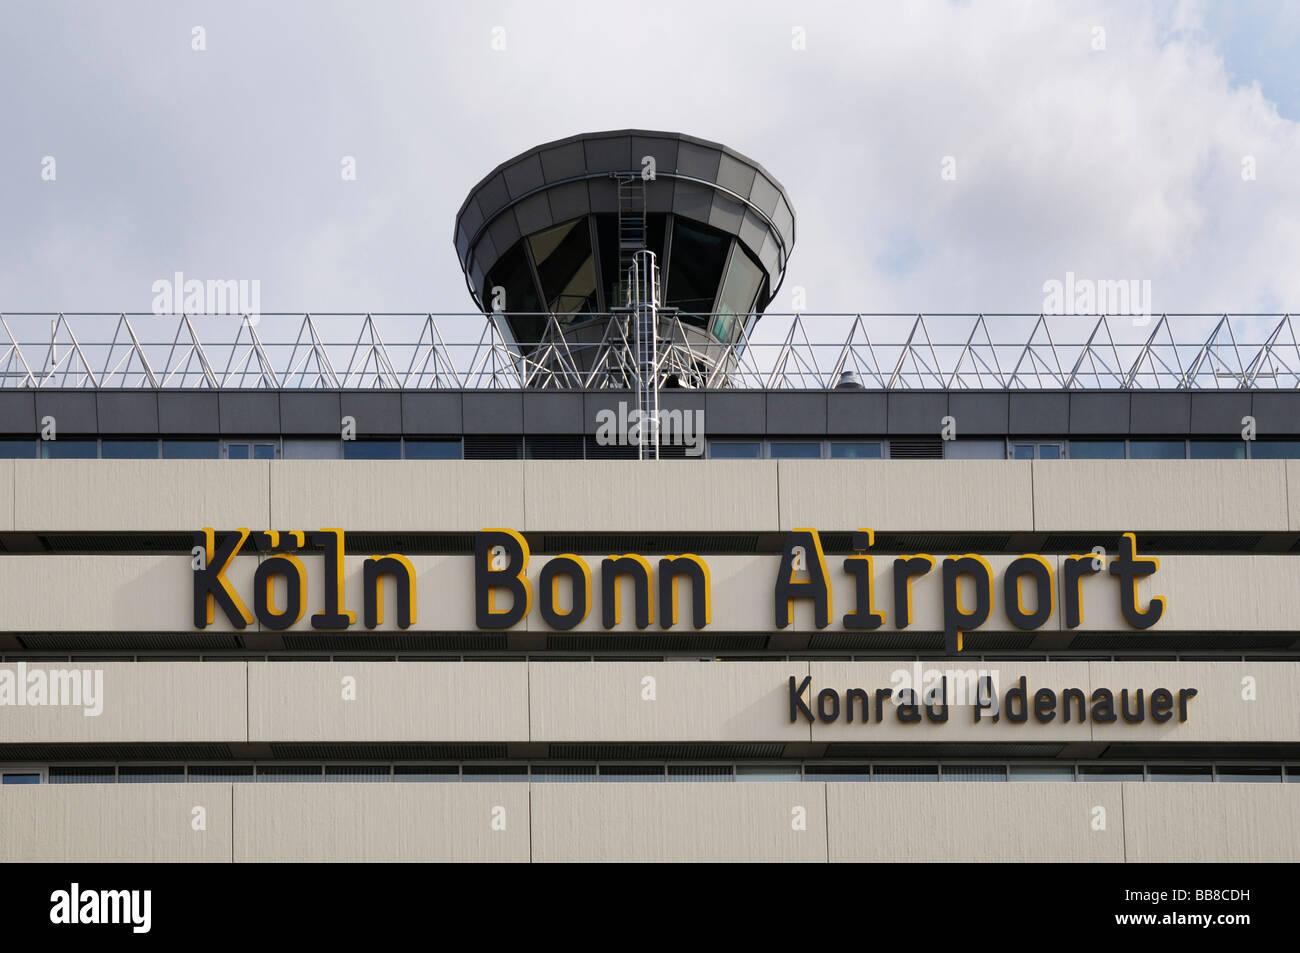 Tower and main building with writing, passenger airport, Cologne Bonn Airport Konrad Adenauer, North Rhine-Westphalia, Germany Stock Photo